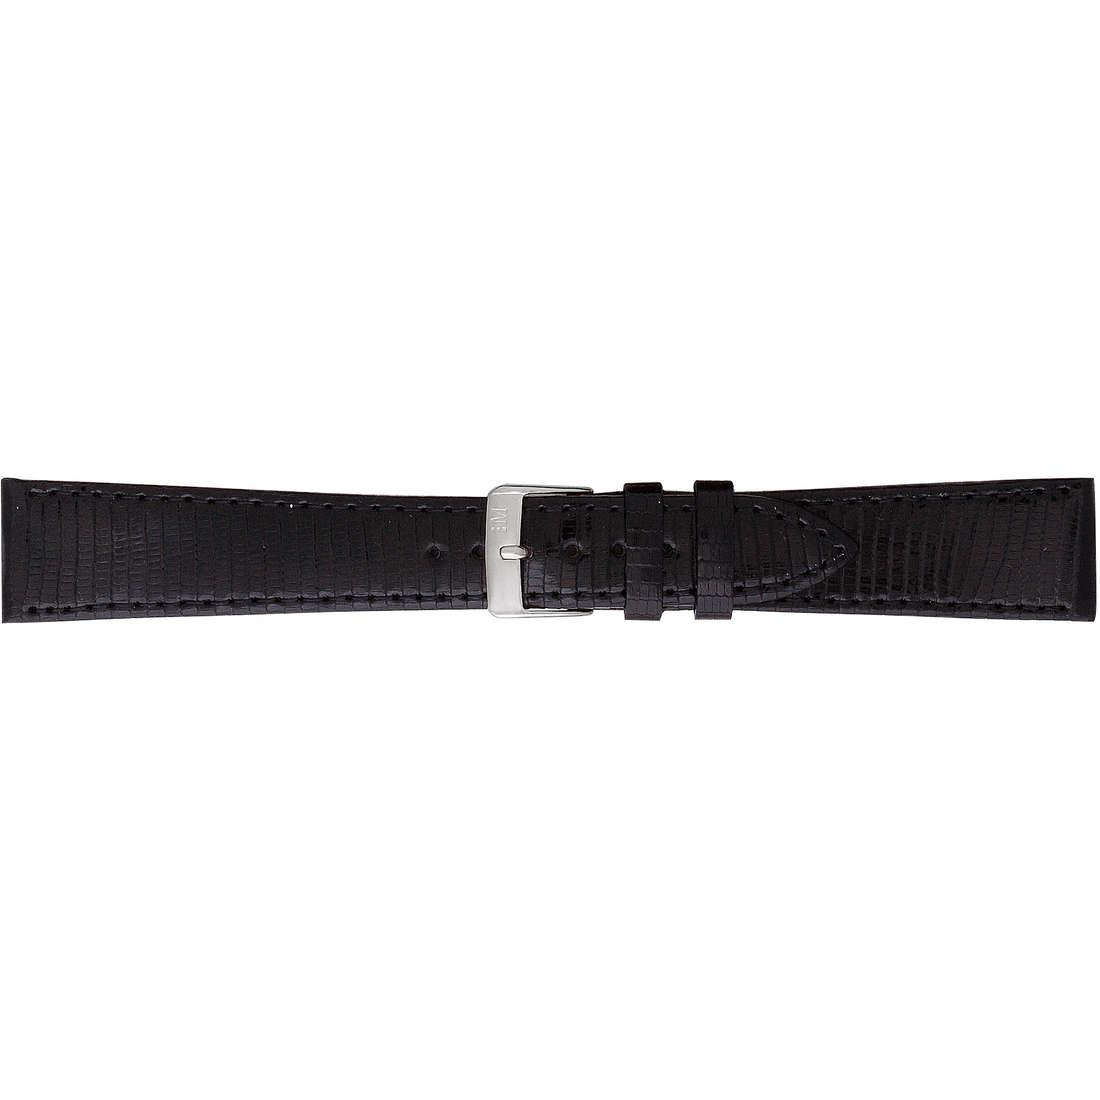 watch watch bands watch straps man Morellato Pelli Preziose A01U0858040019CR16